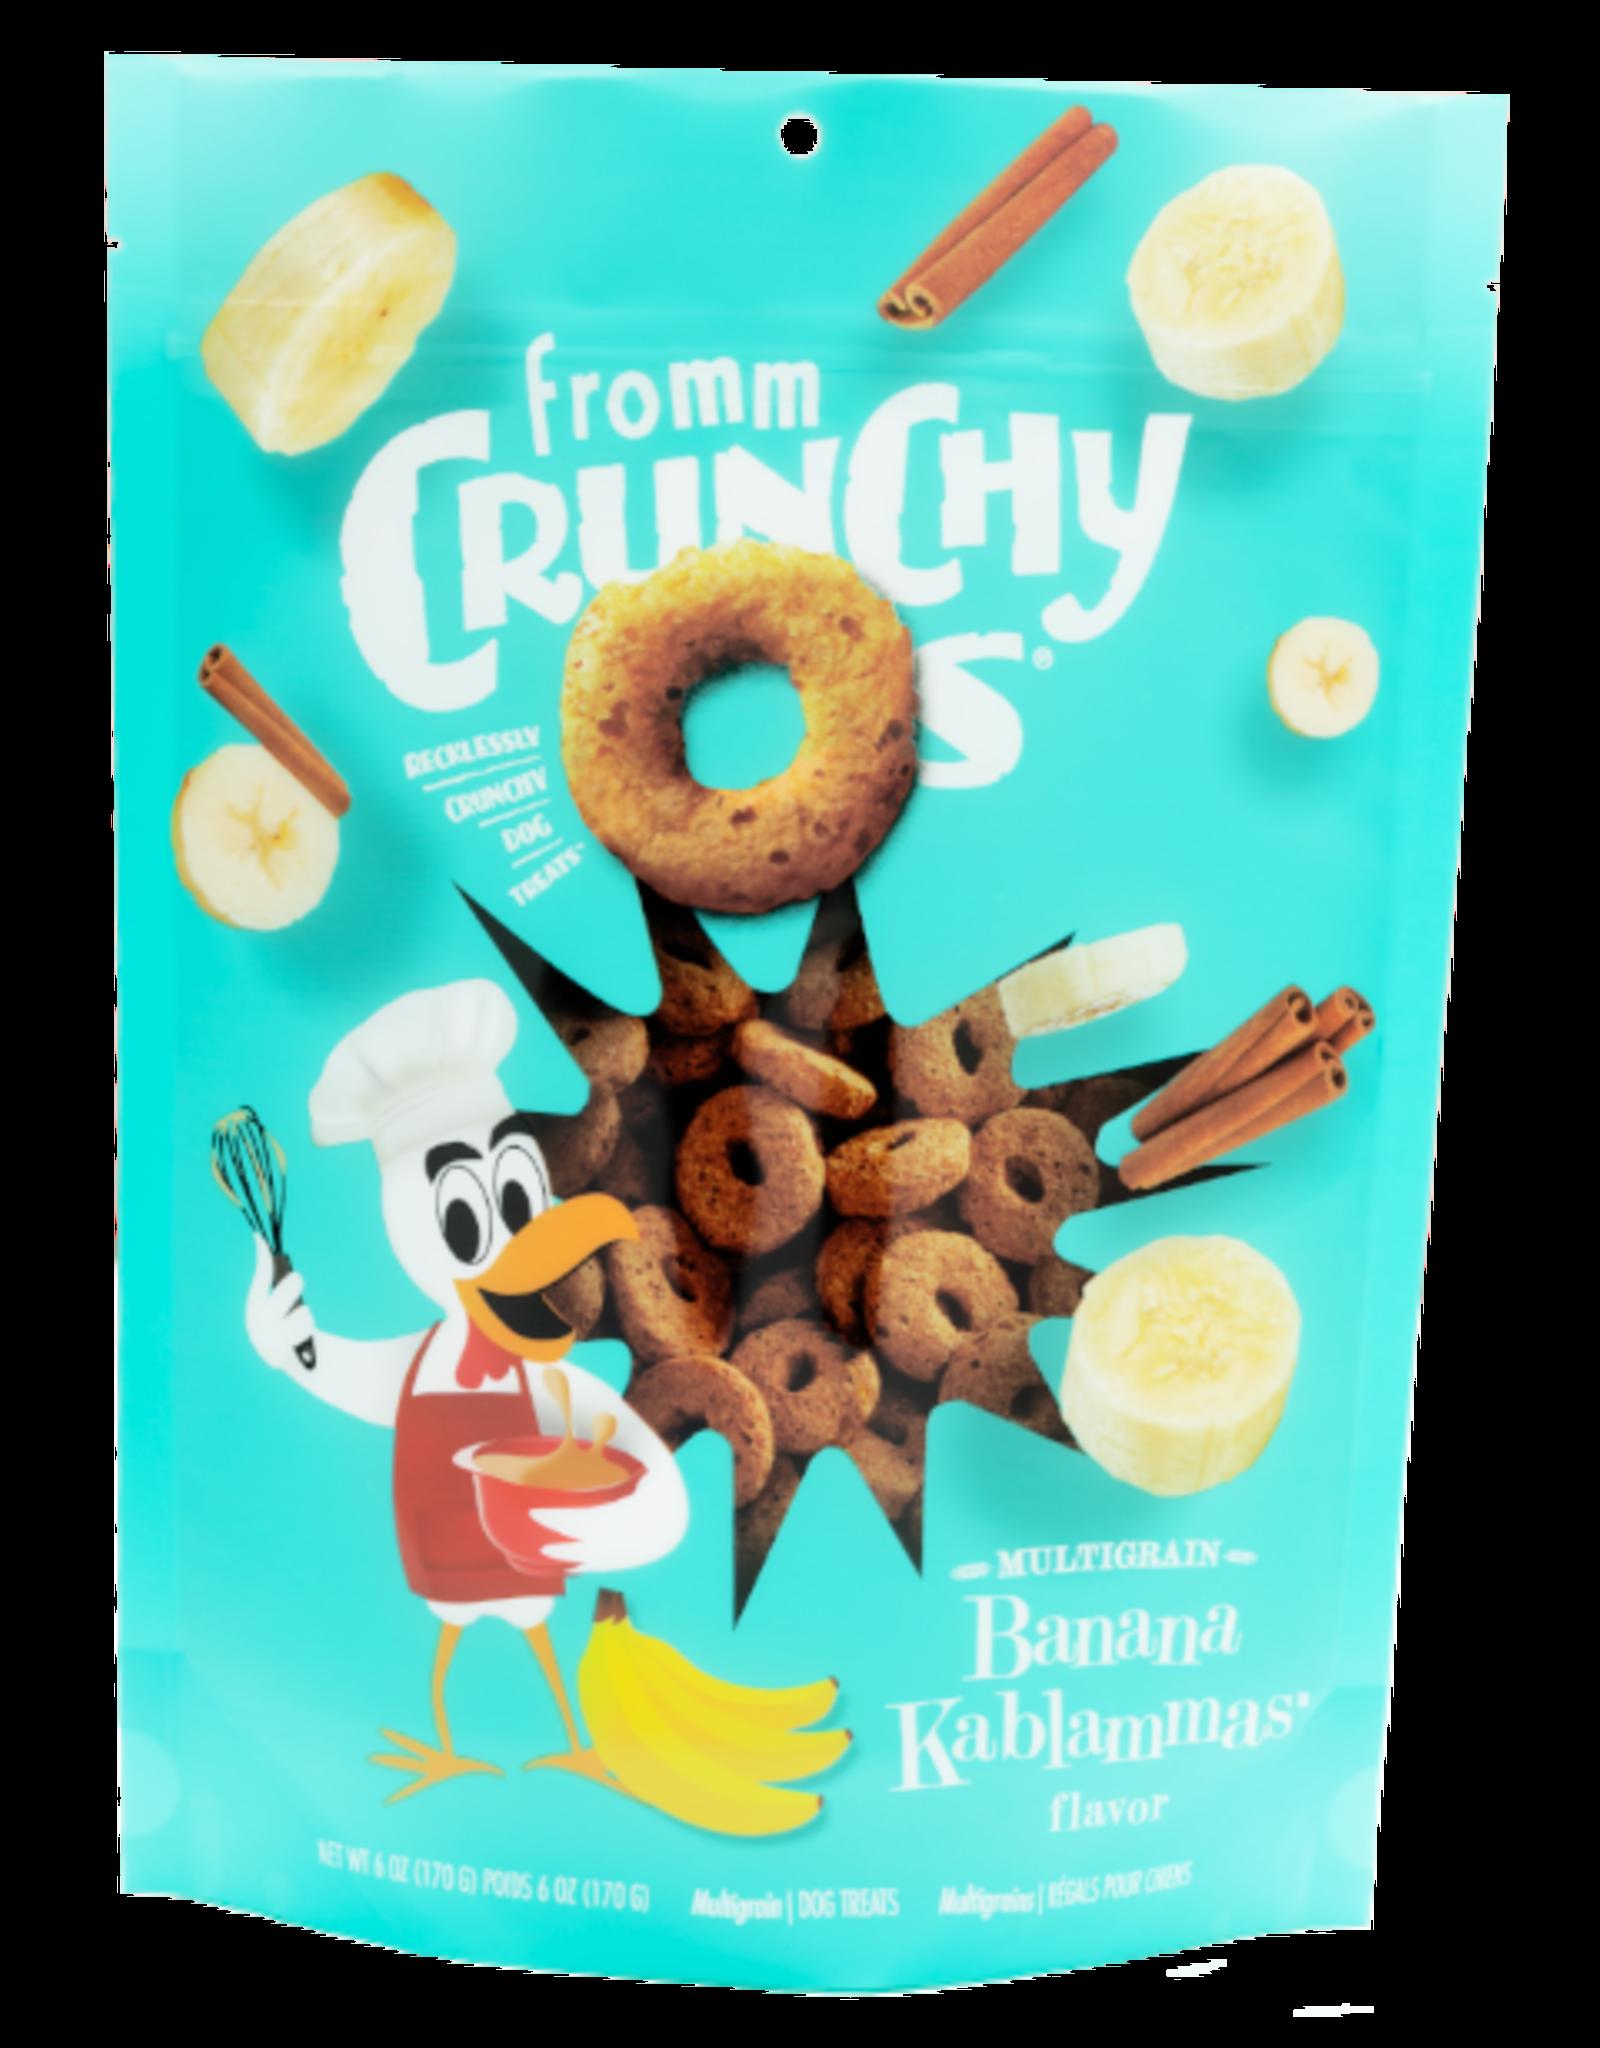 Fromm Fromm Crunchy O's - Banana Kablammas 6oz